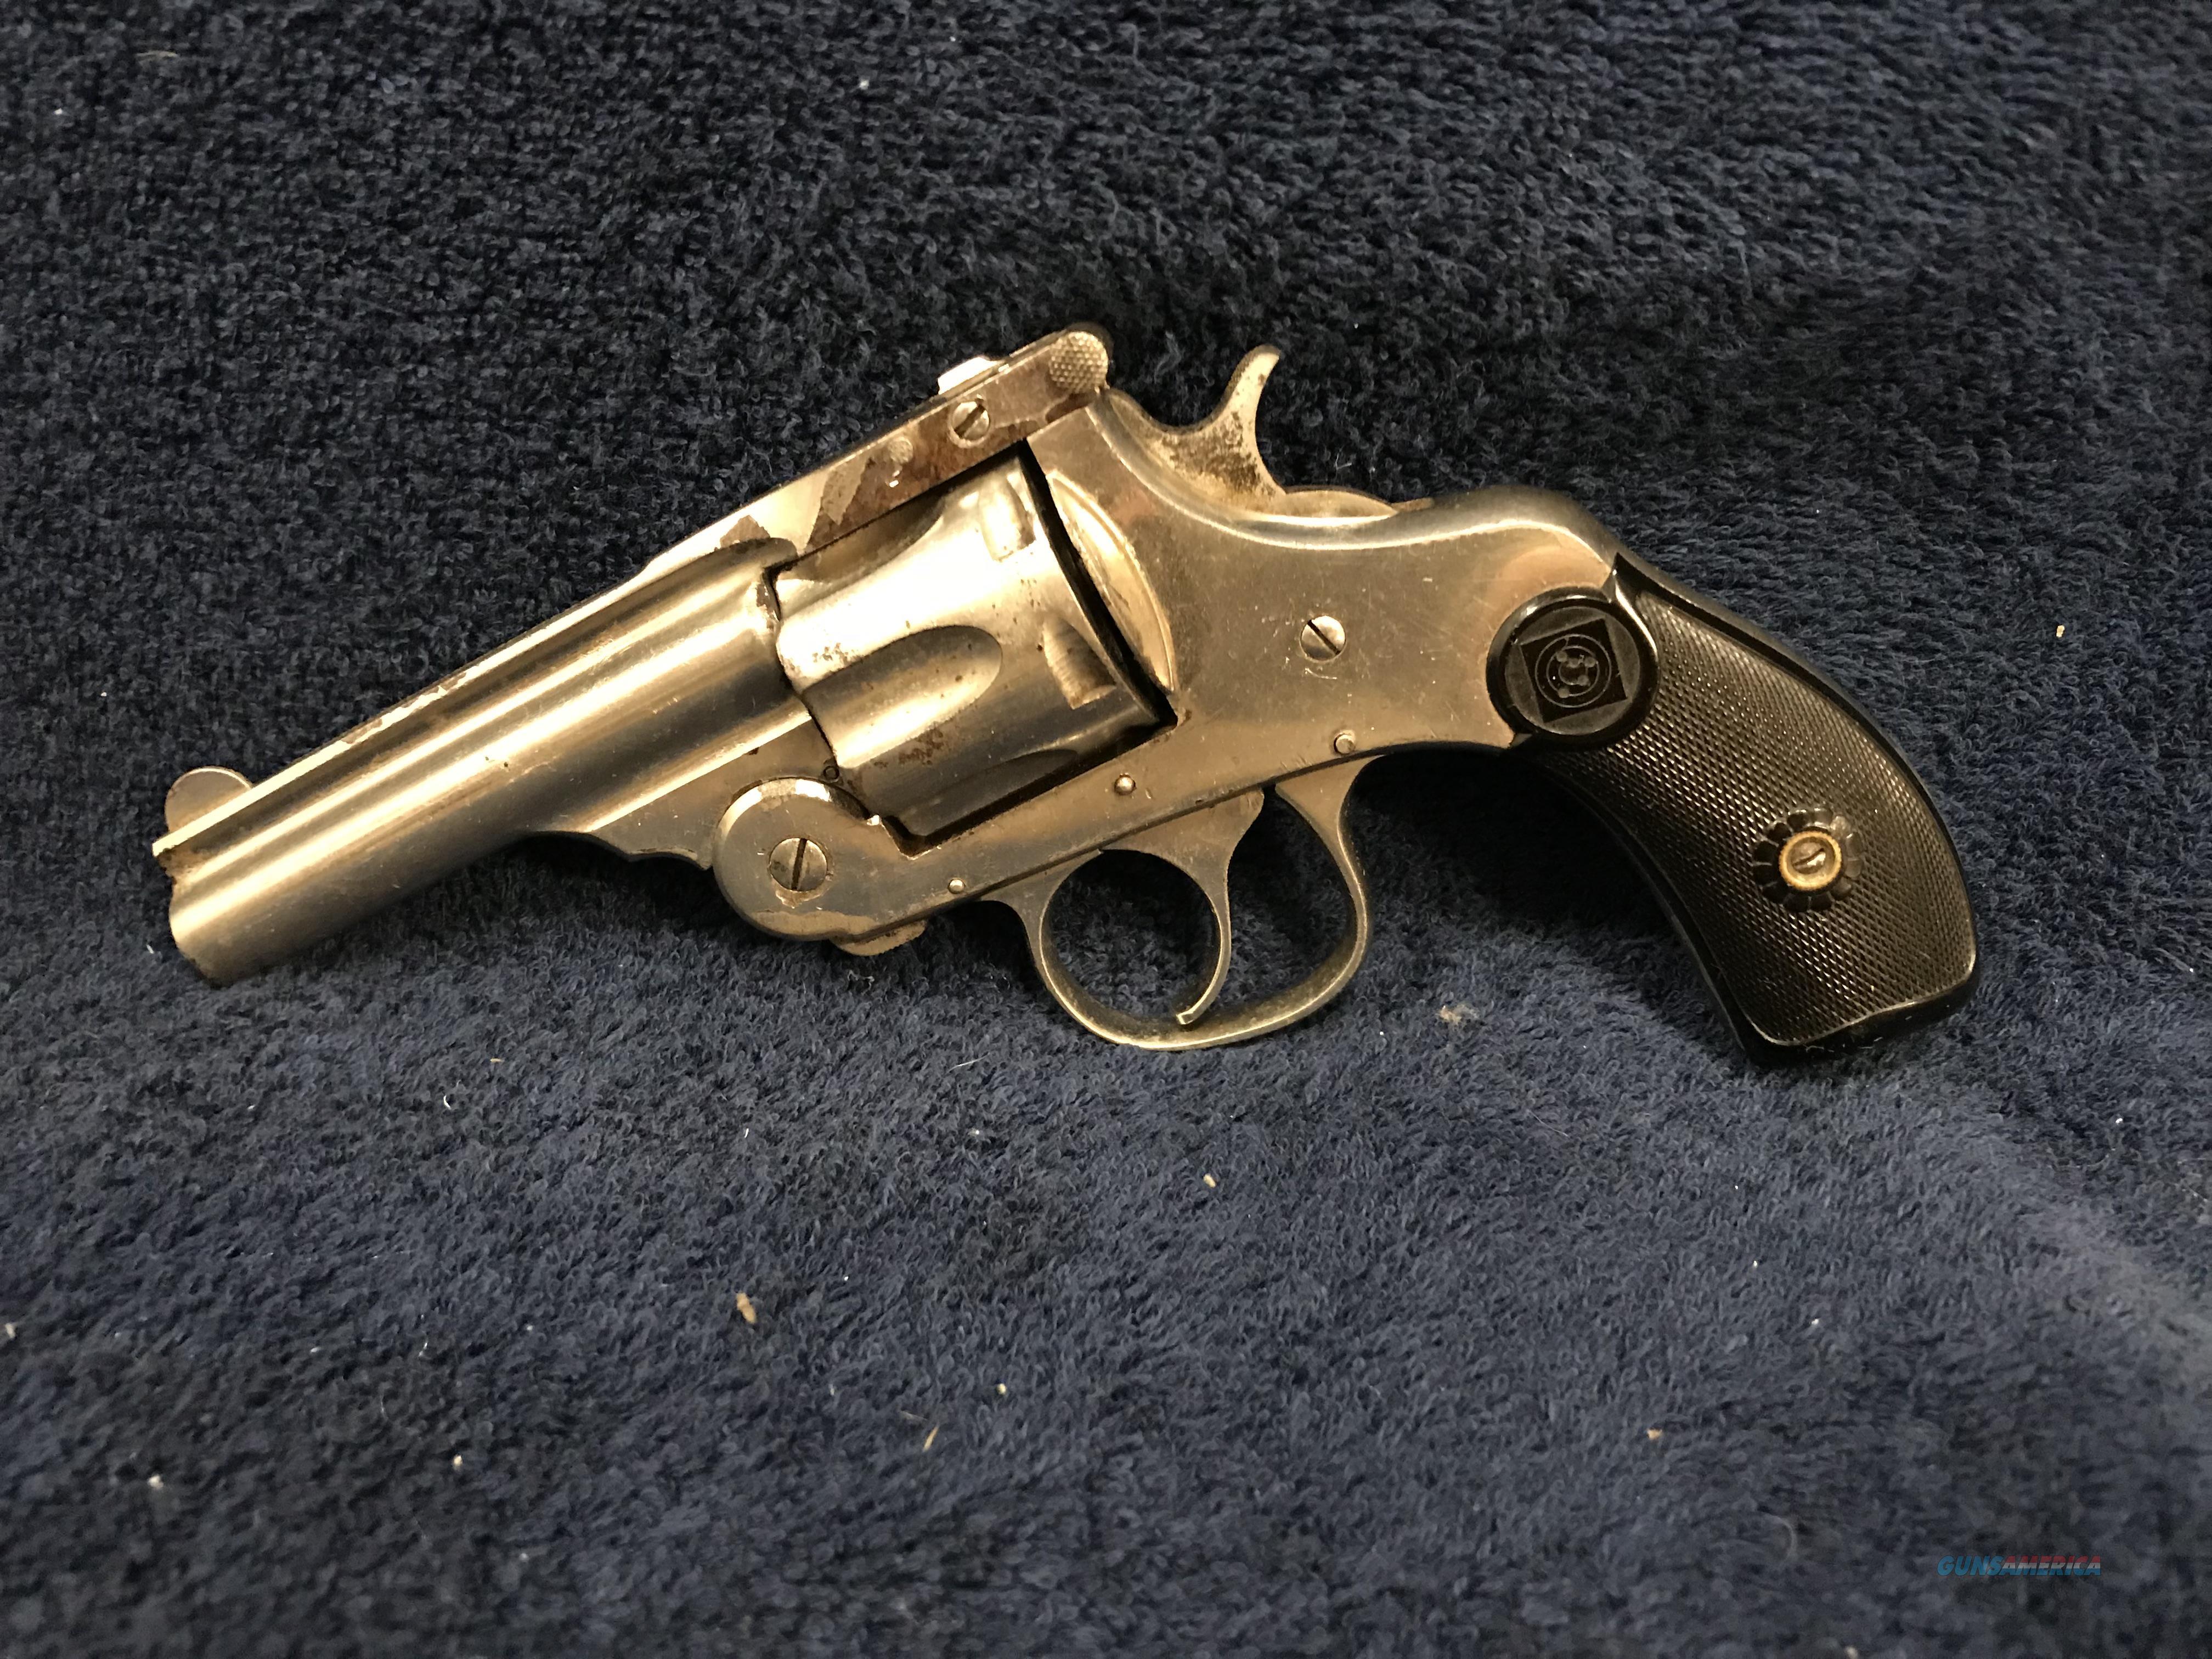 Harrington & Richardson mod. 1880  Guns > Pistols > Harrington & Richardson Pistols